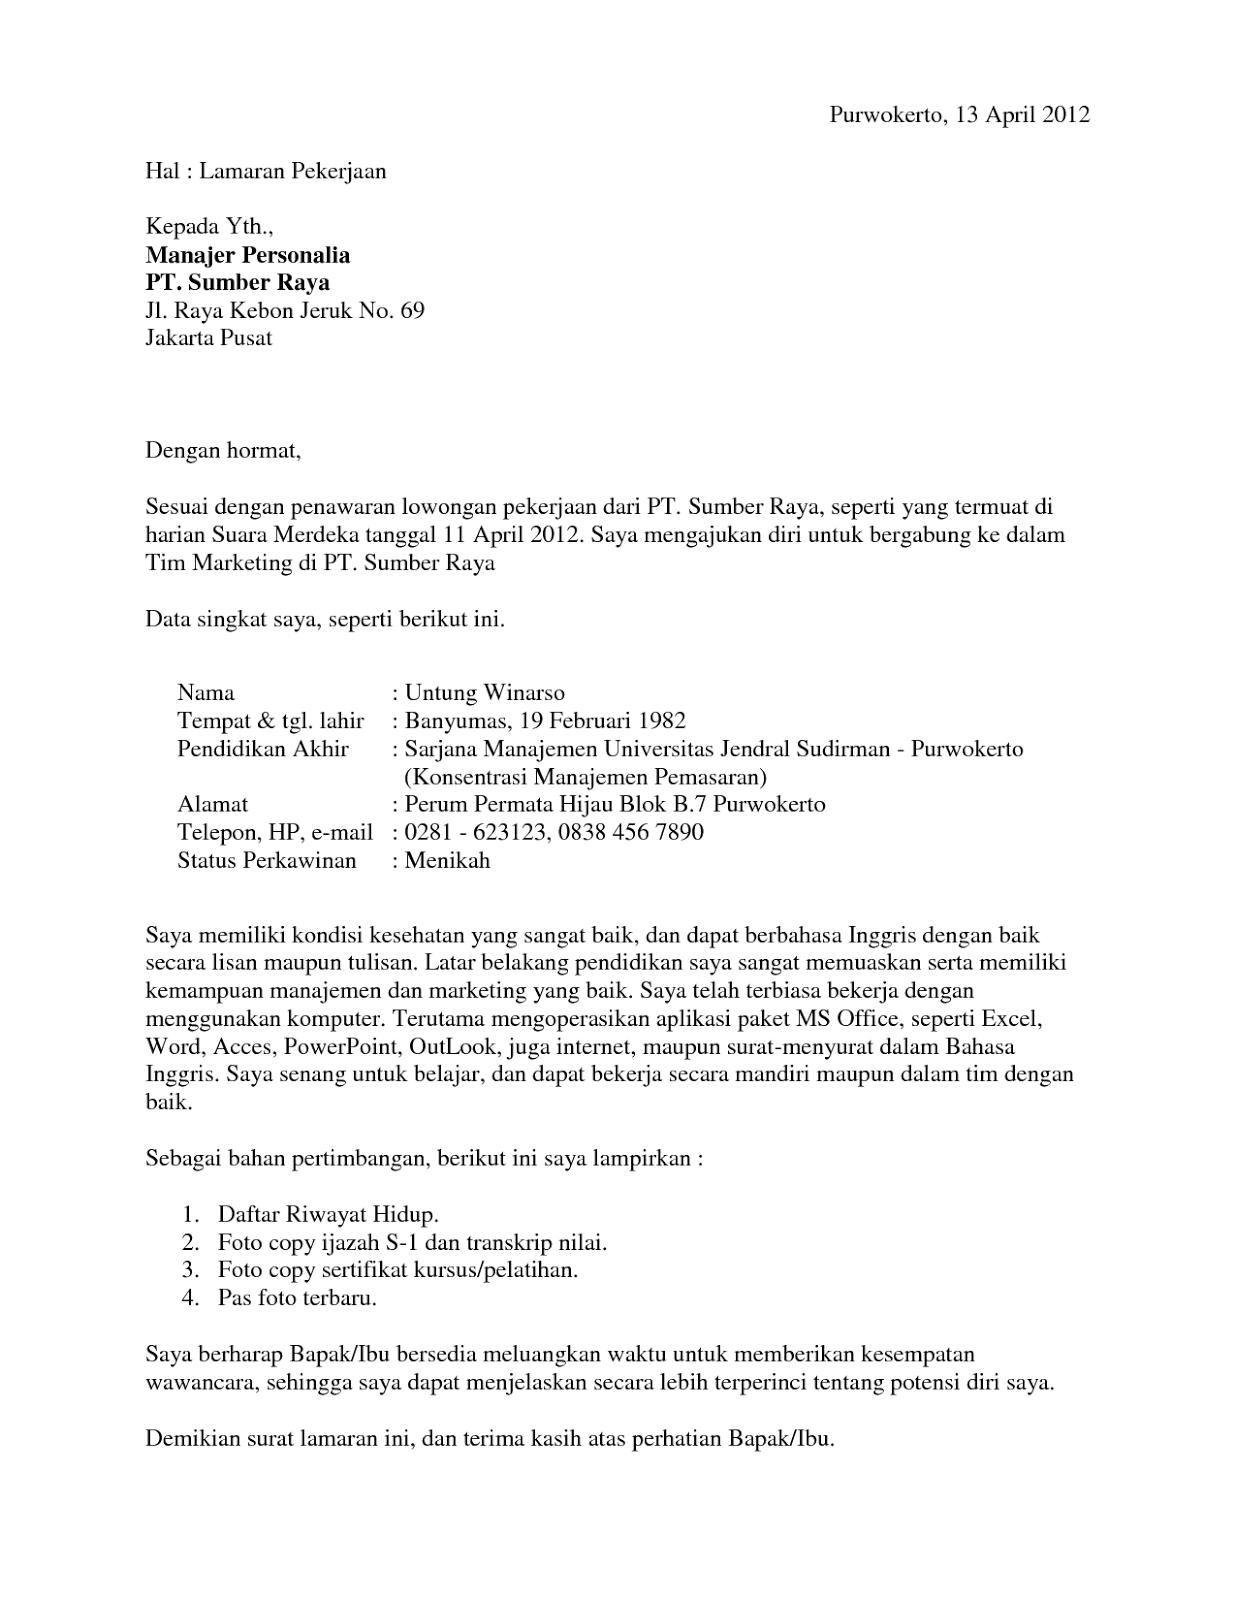 Contoh Surat Lamaran Pekerjaan Akuntansi Contoh Surat